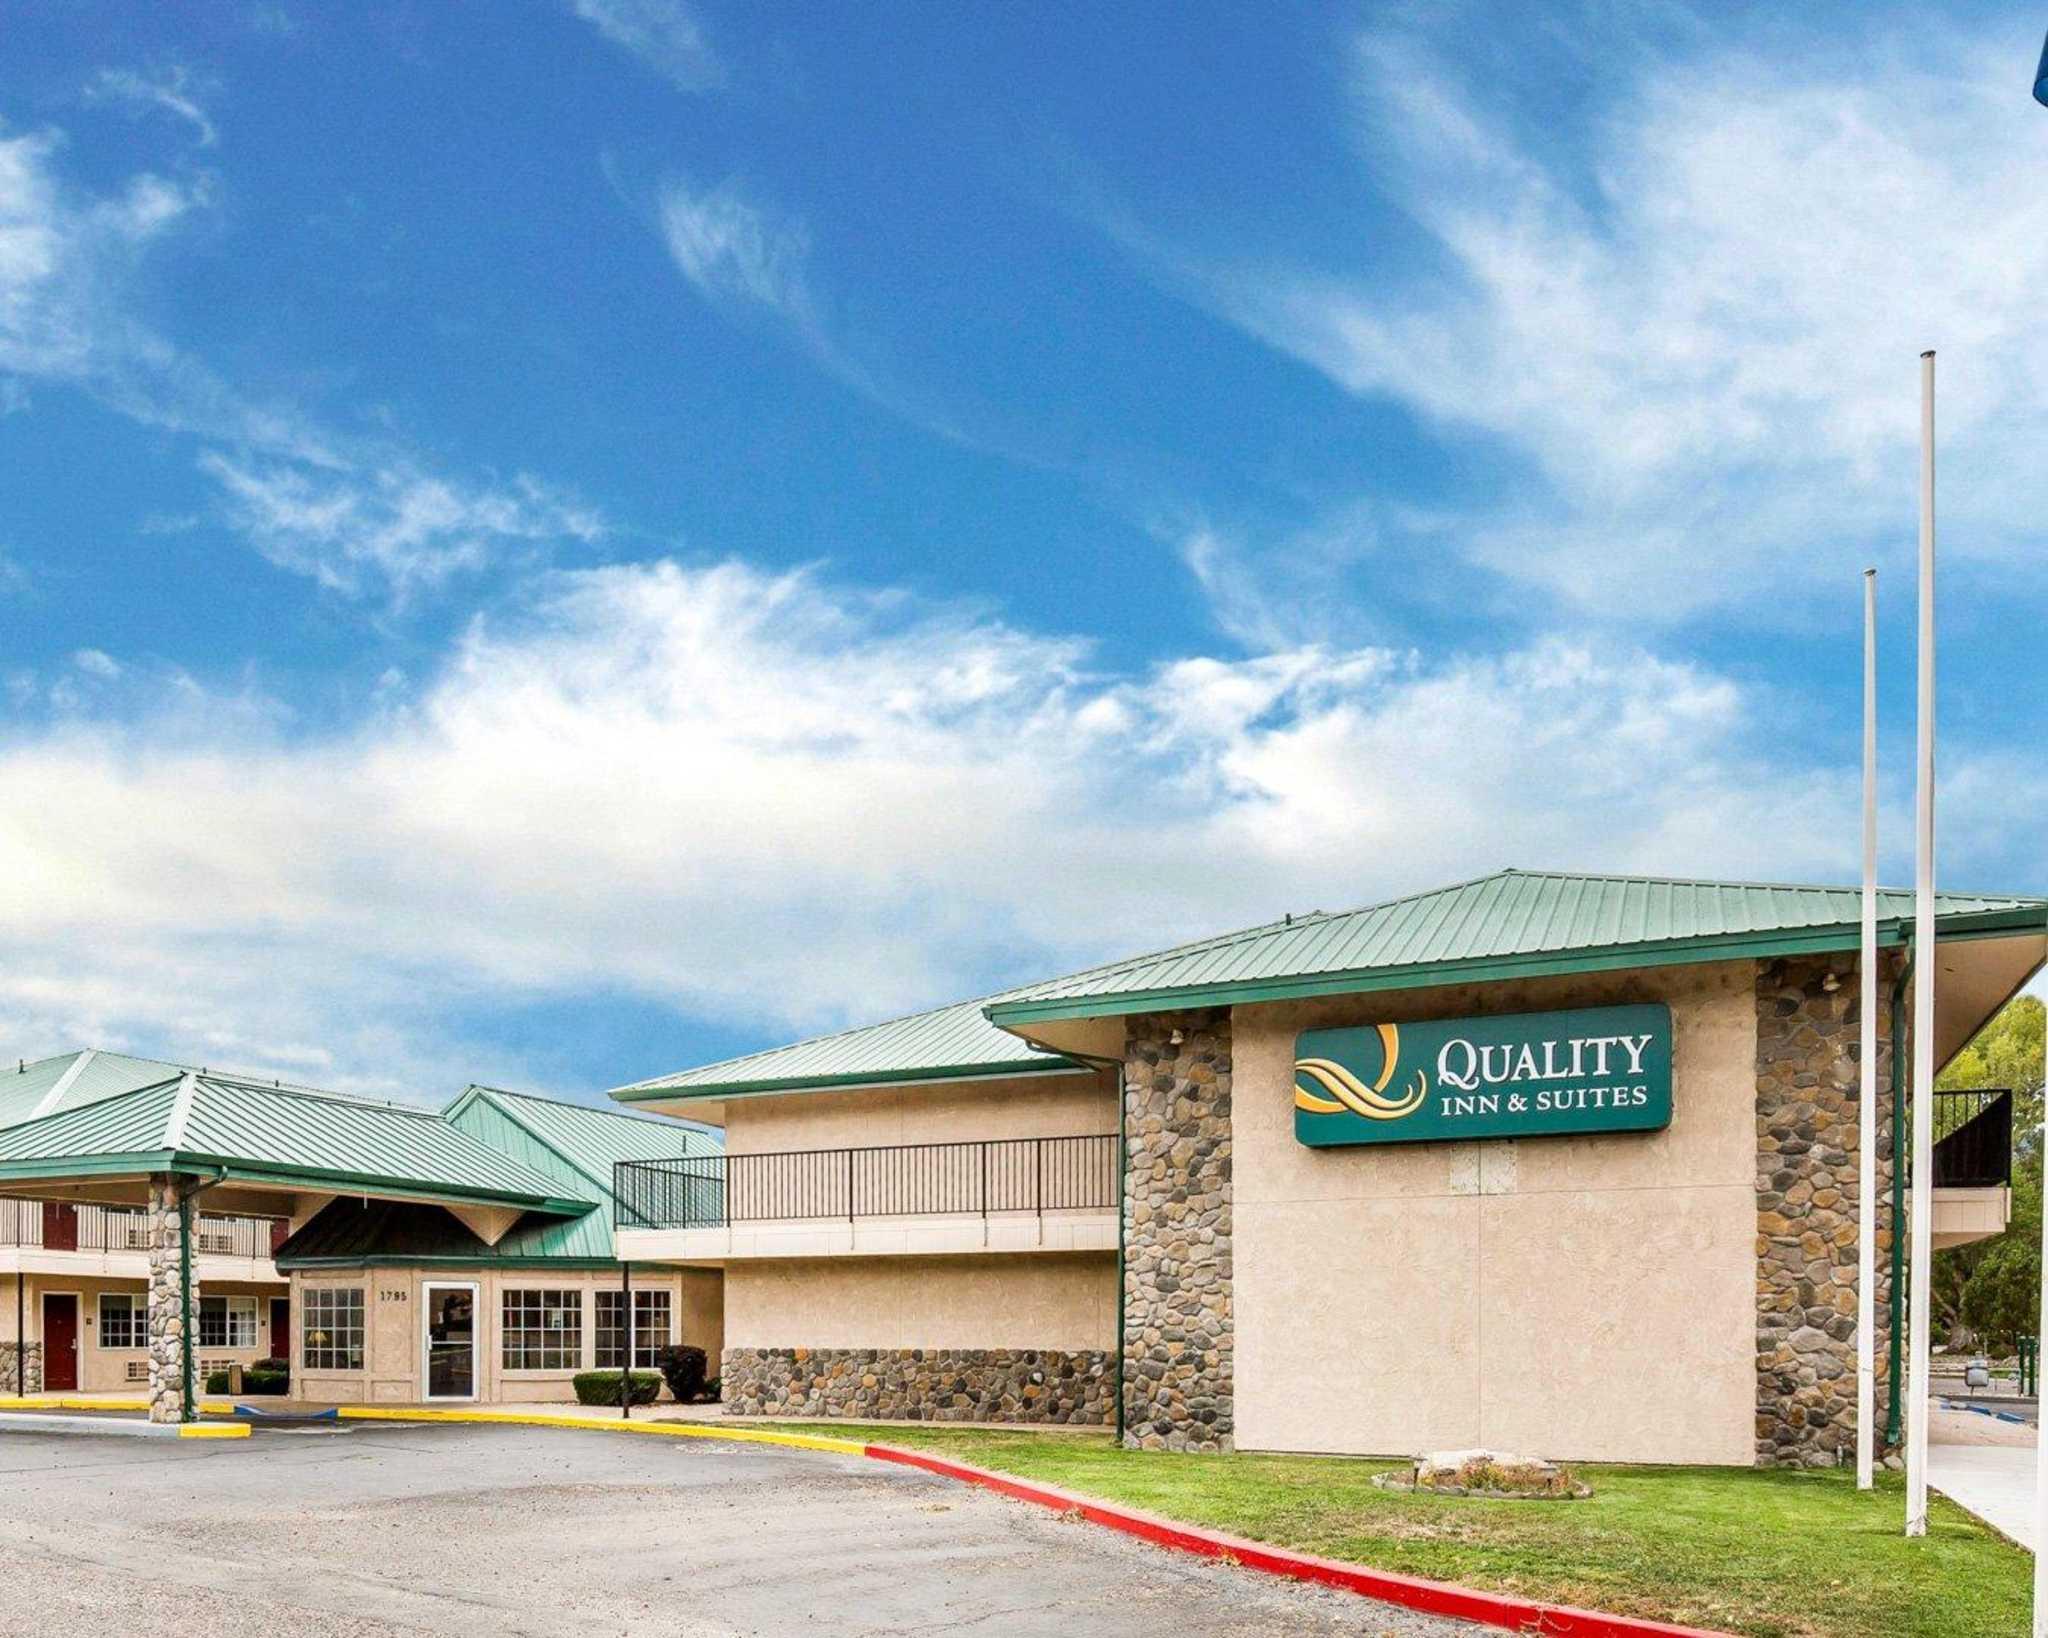 Quality Inn & Suites Minden US-395 image 0